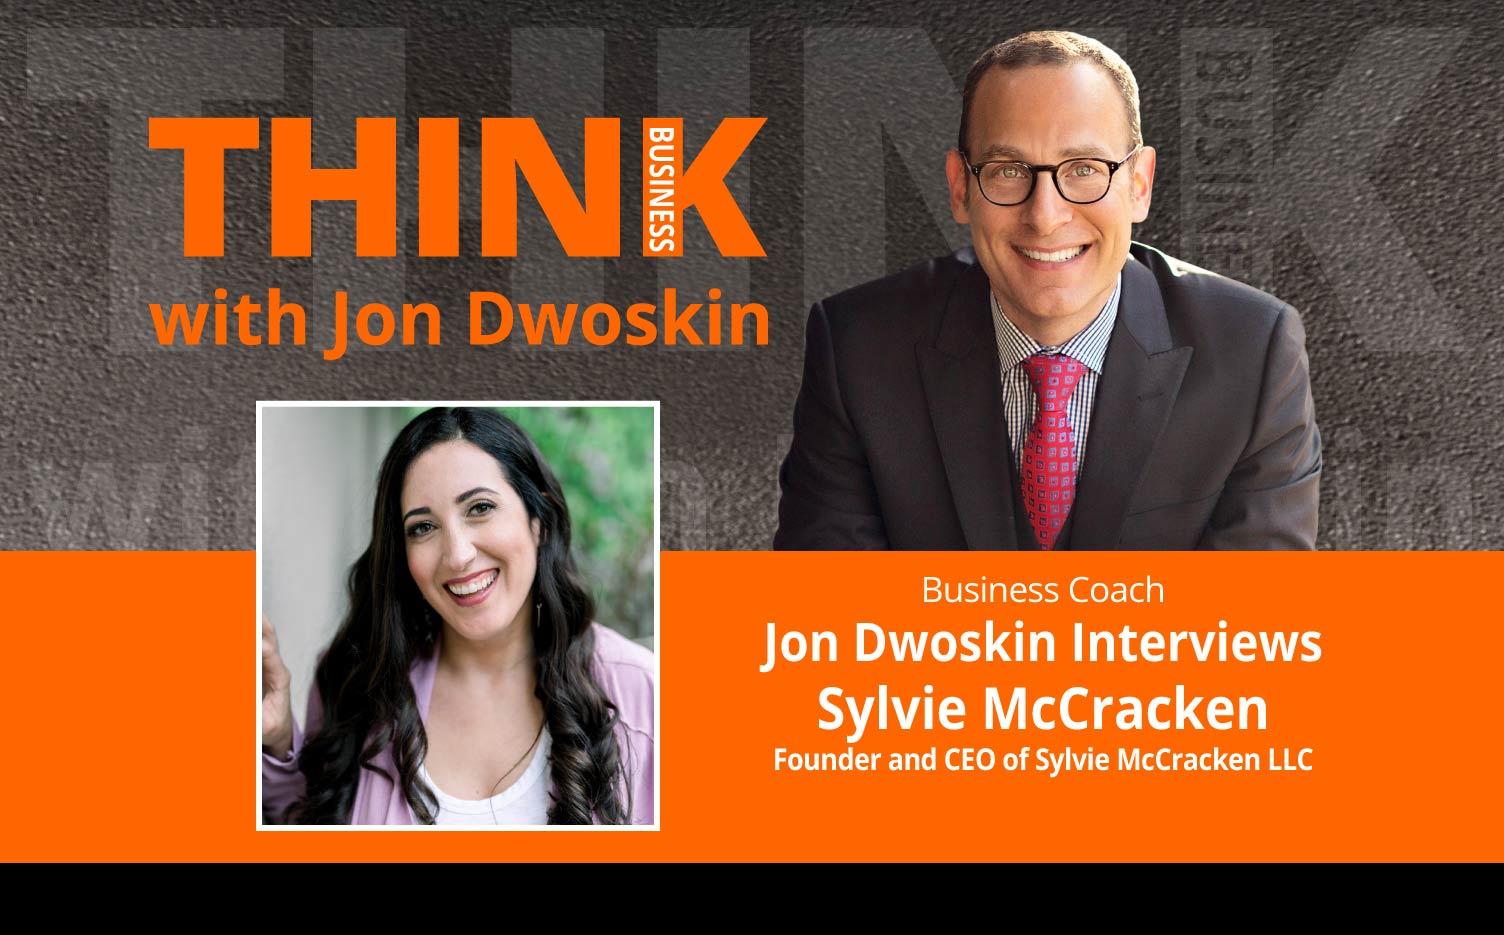 THINK Business Podcast: Jon Dwoskin Interviews Sylvie McCracken, Founder and CEO of Sylvie McCracken LLC